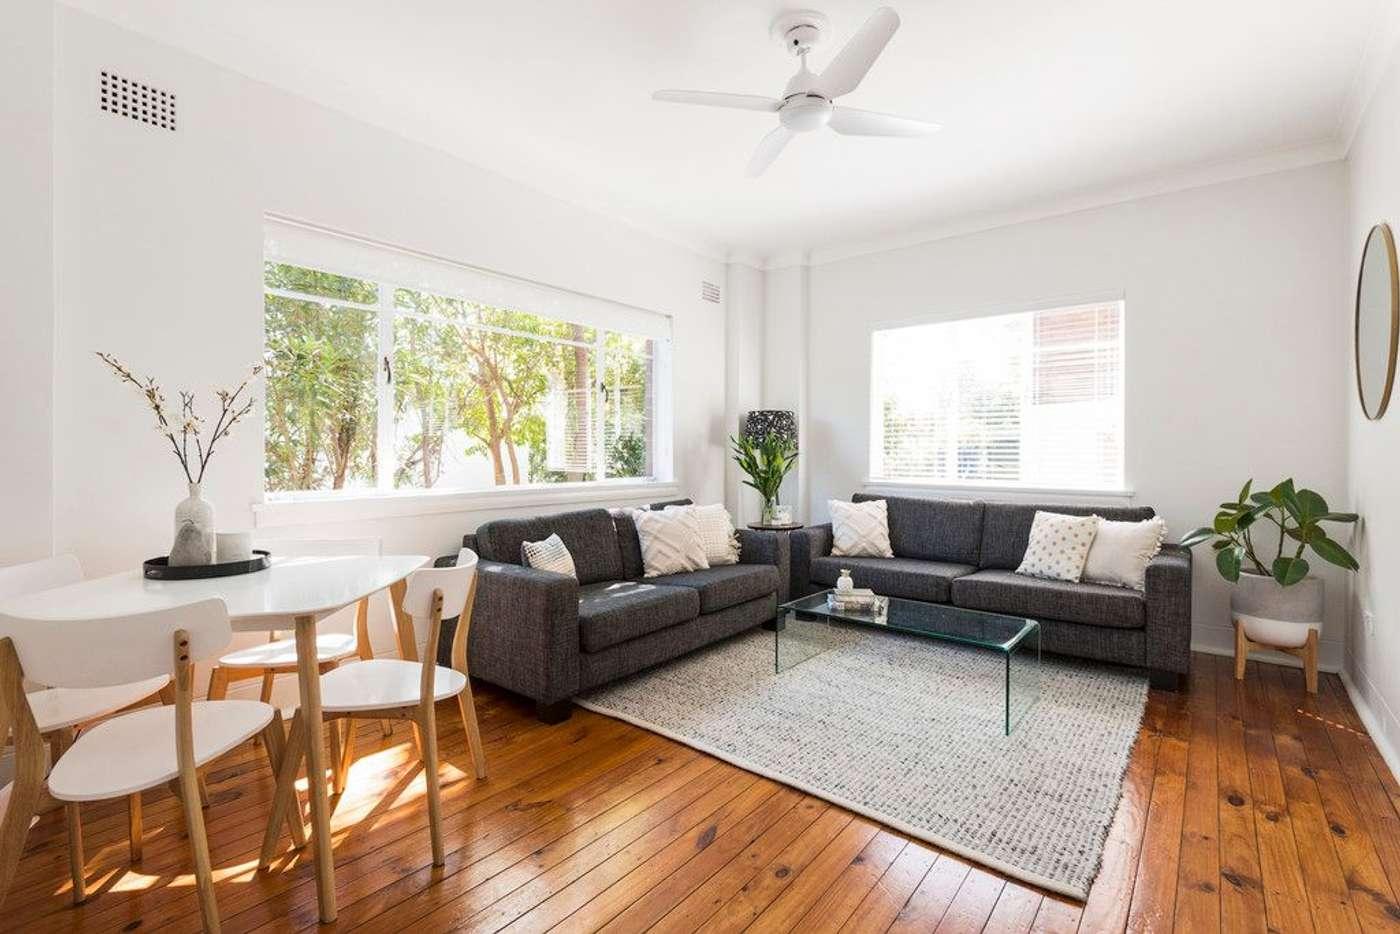 Main view of Homely apartment listing, 1/60B Raglan Street, Mosman NSW 2088